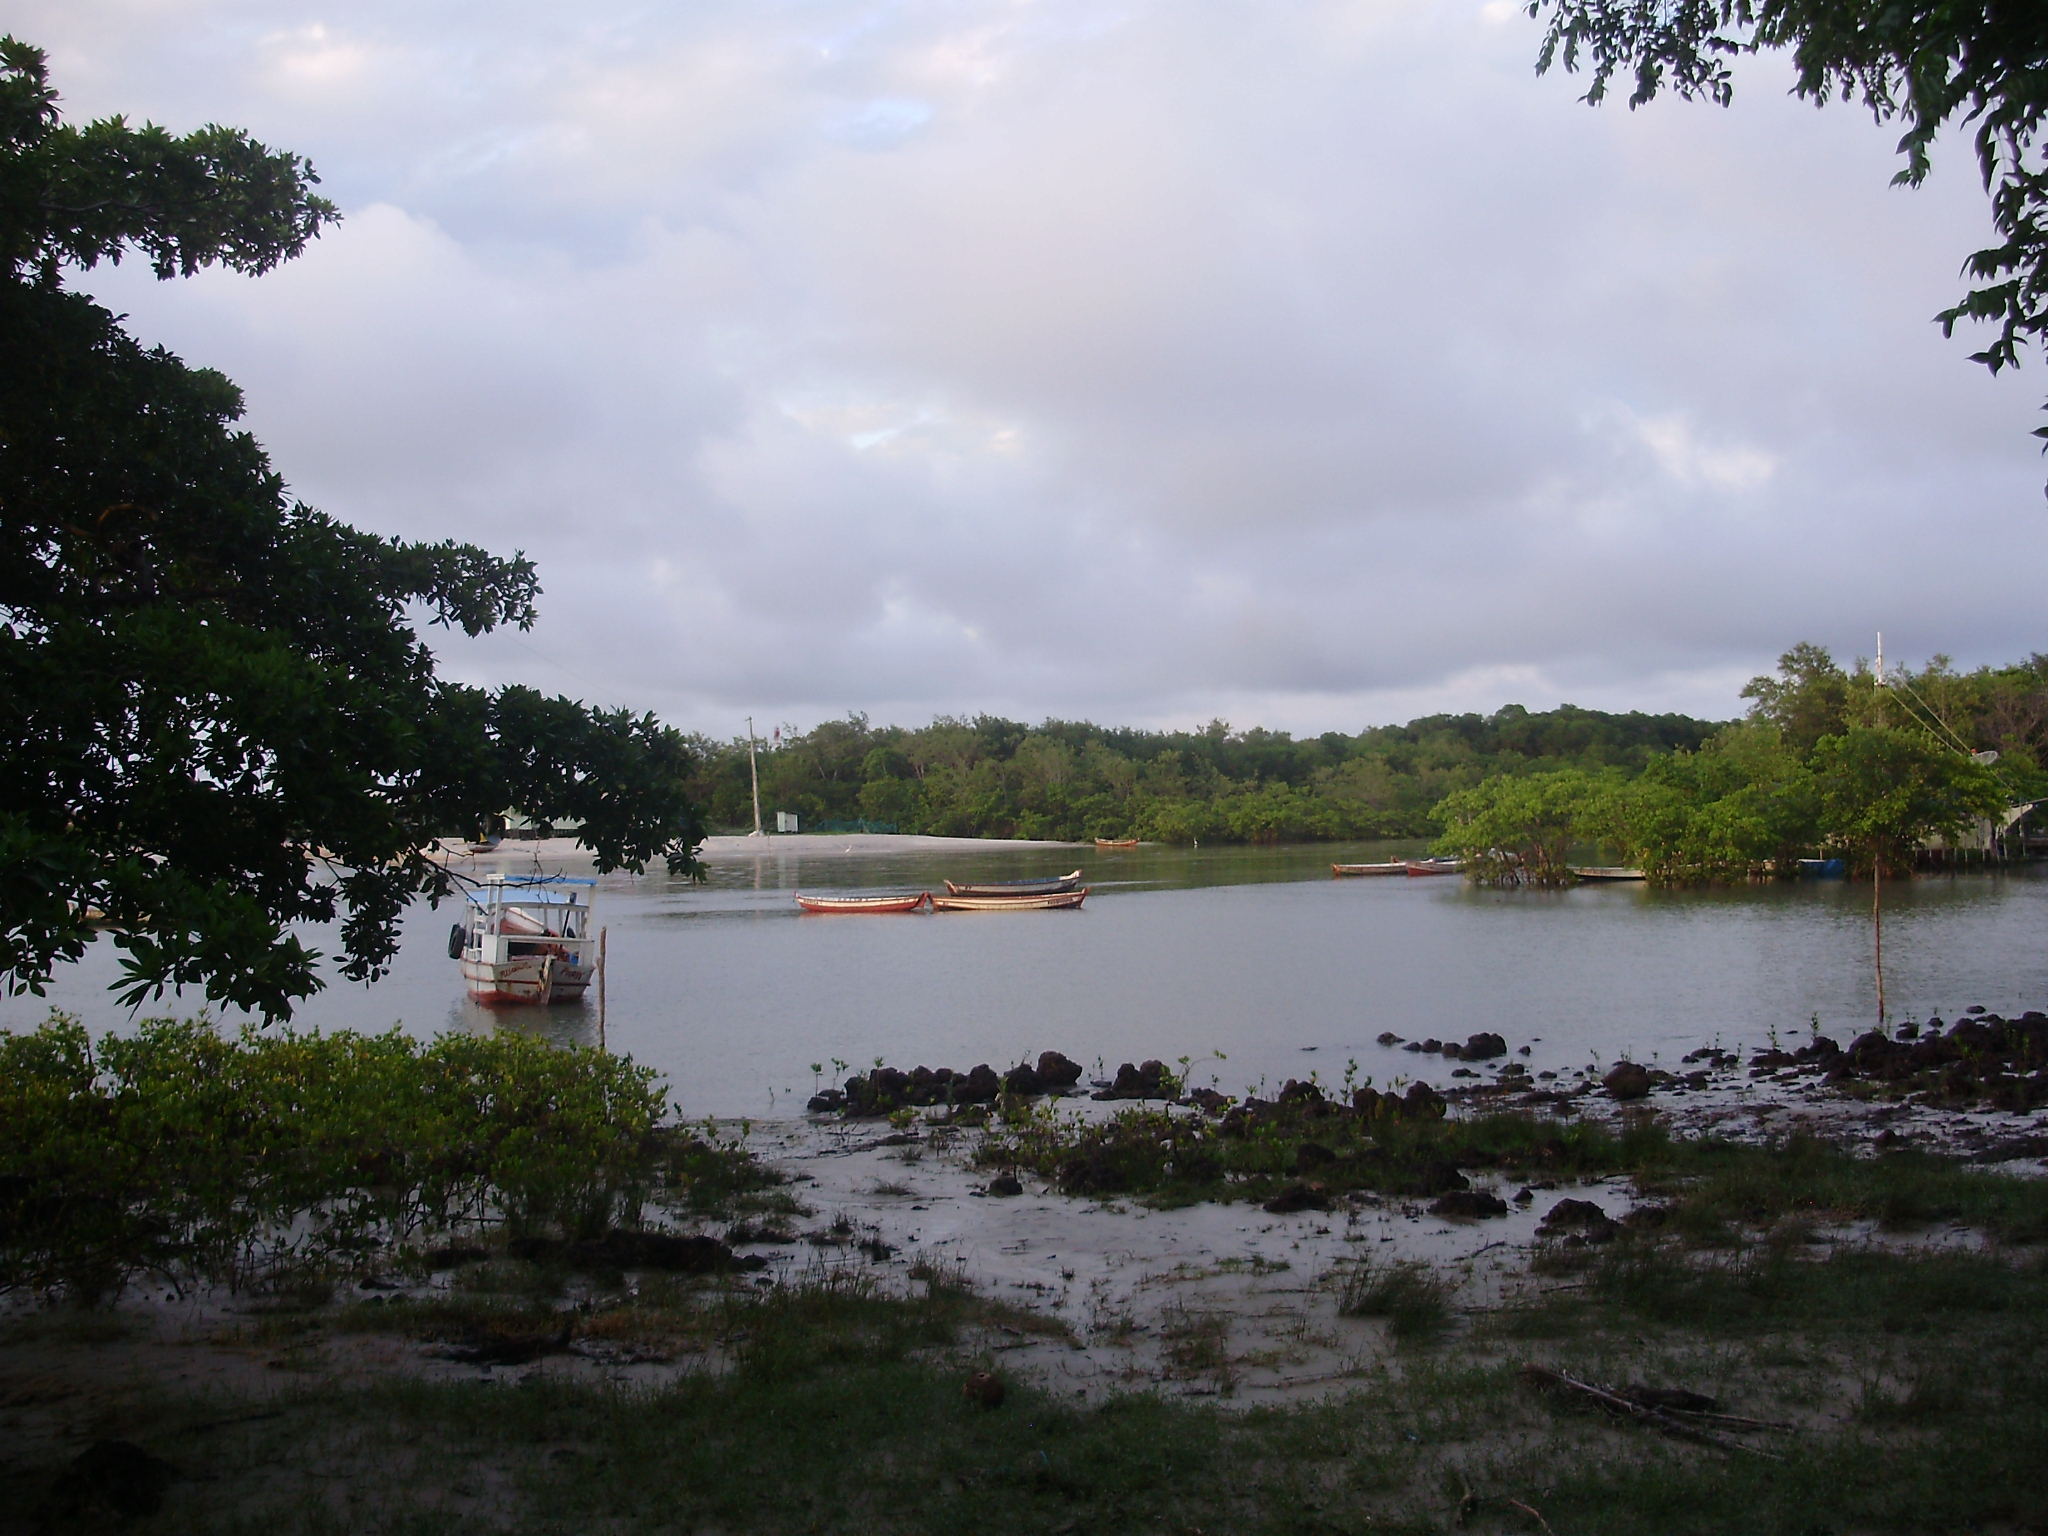 TRAVESSIA DO CANAL